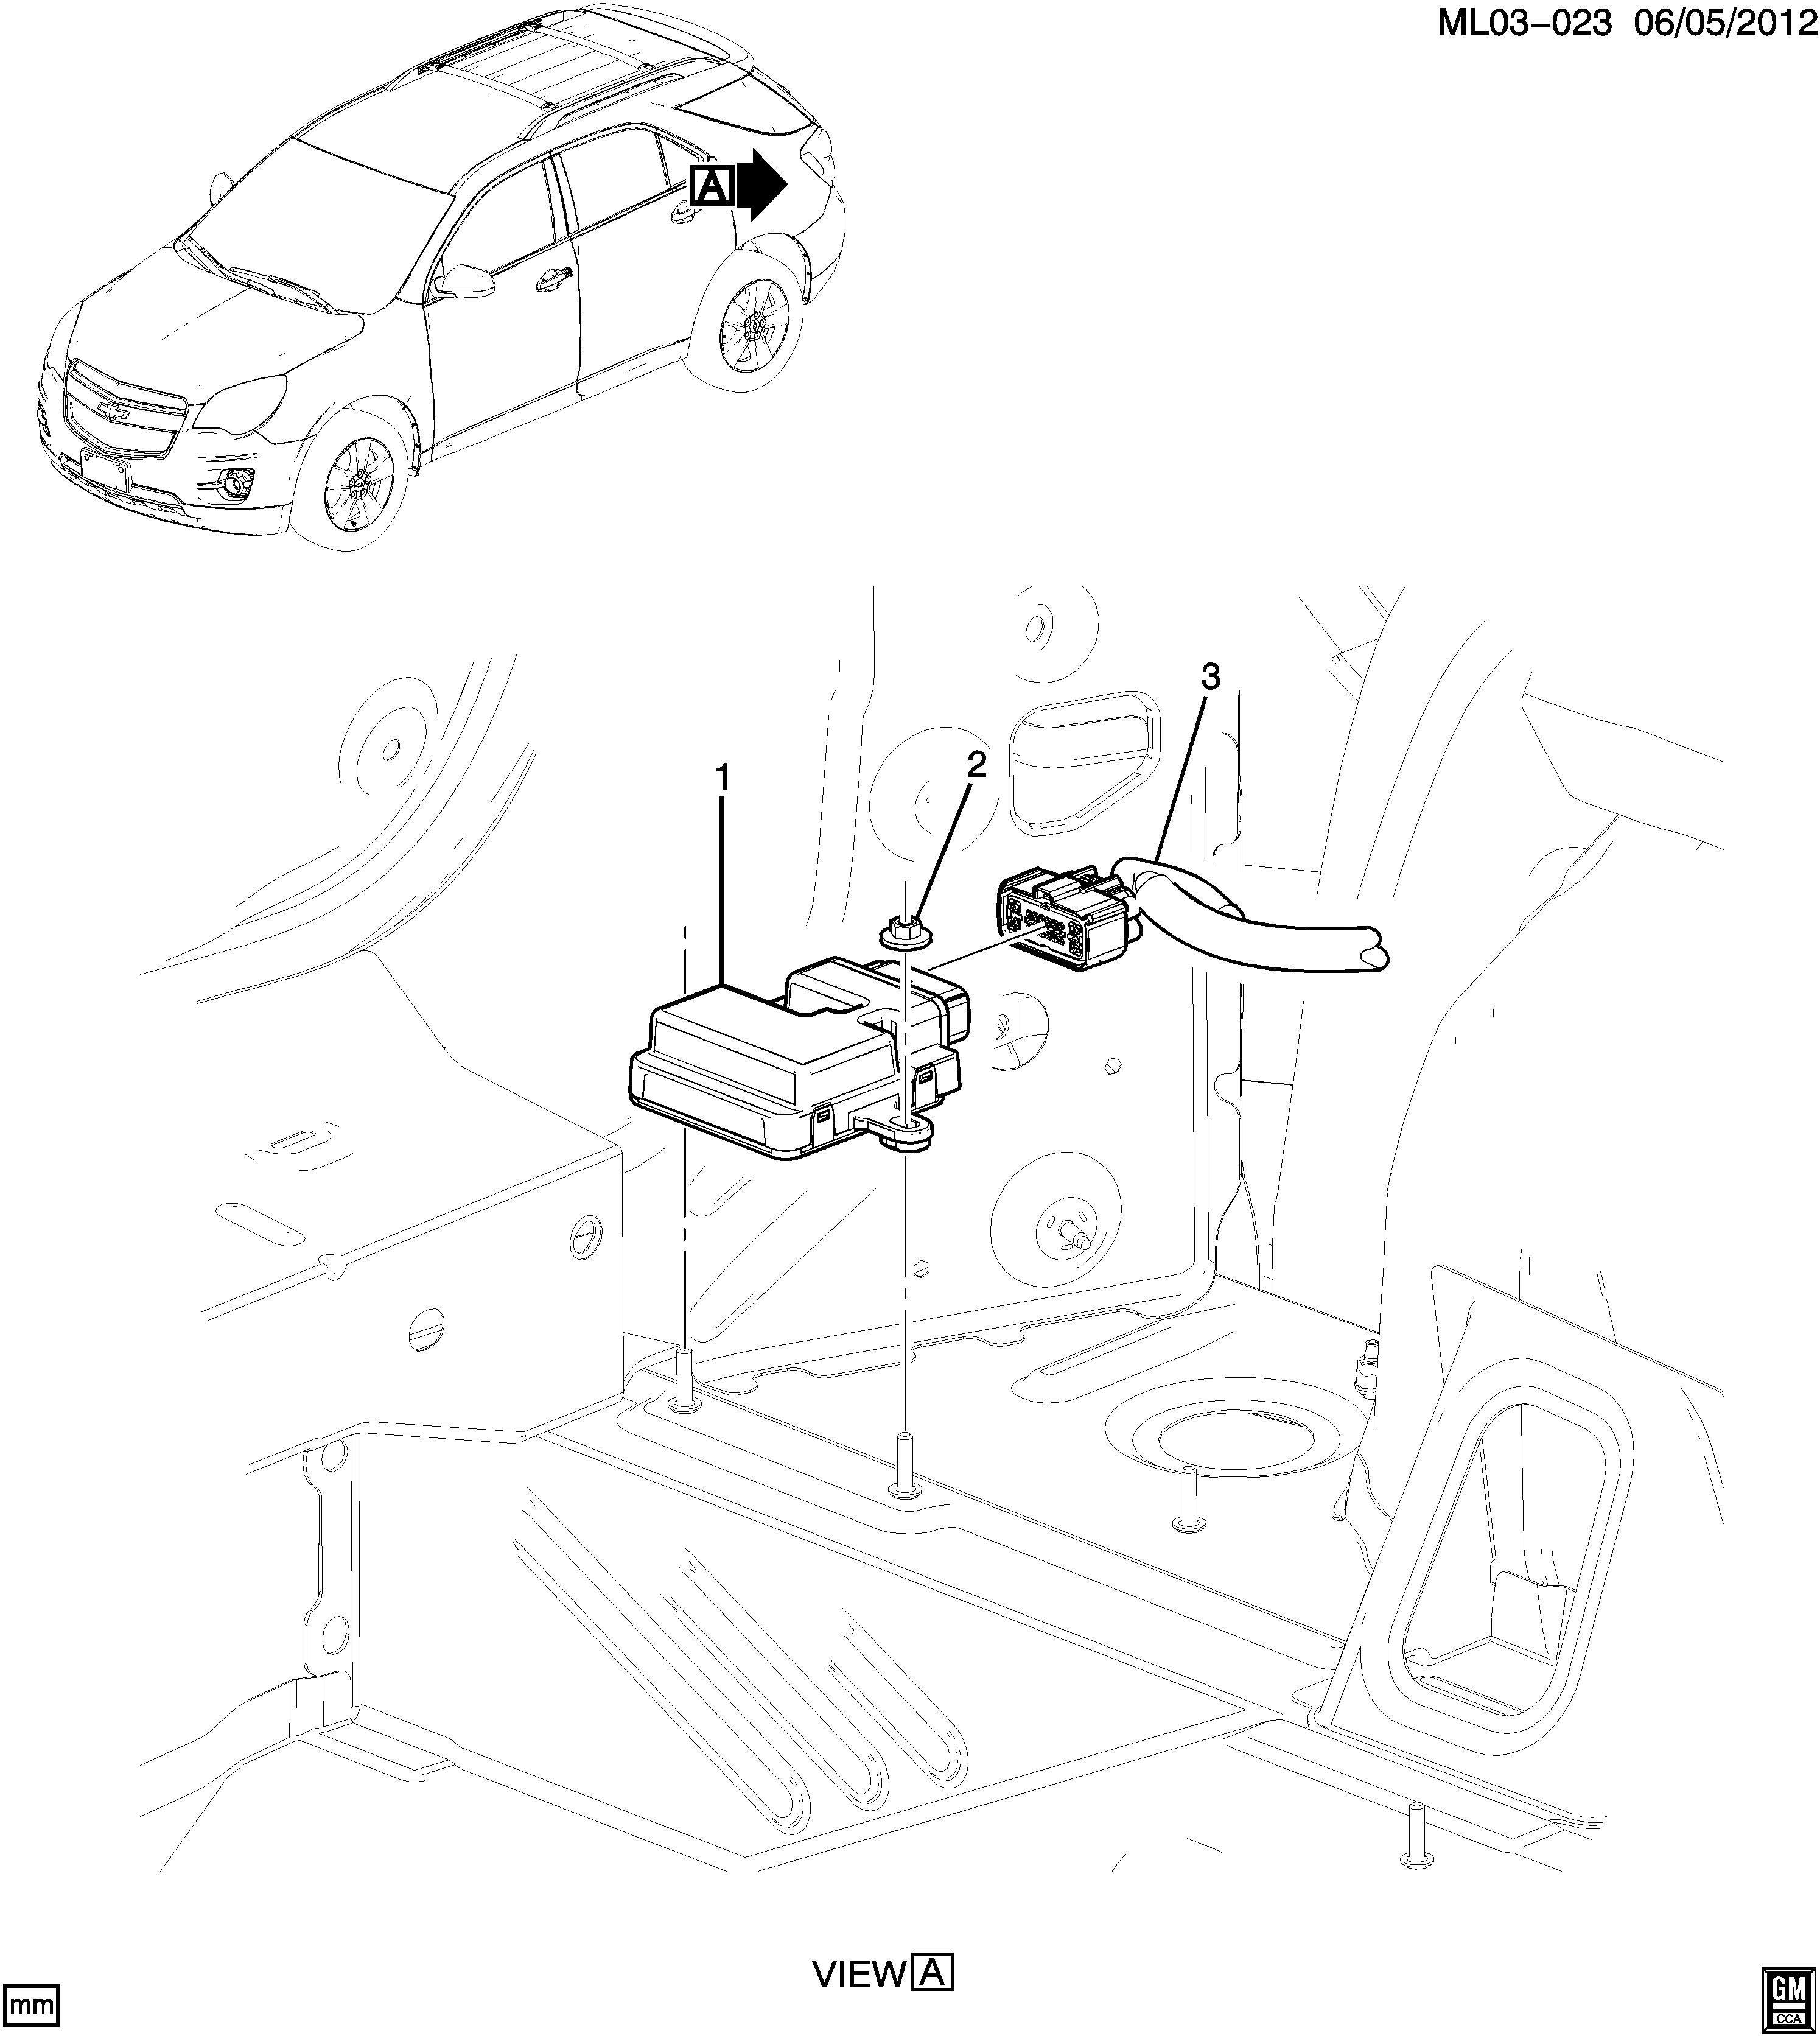 2010 chevy equinox body control module location